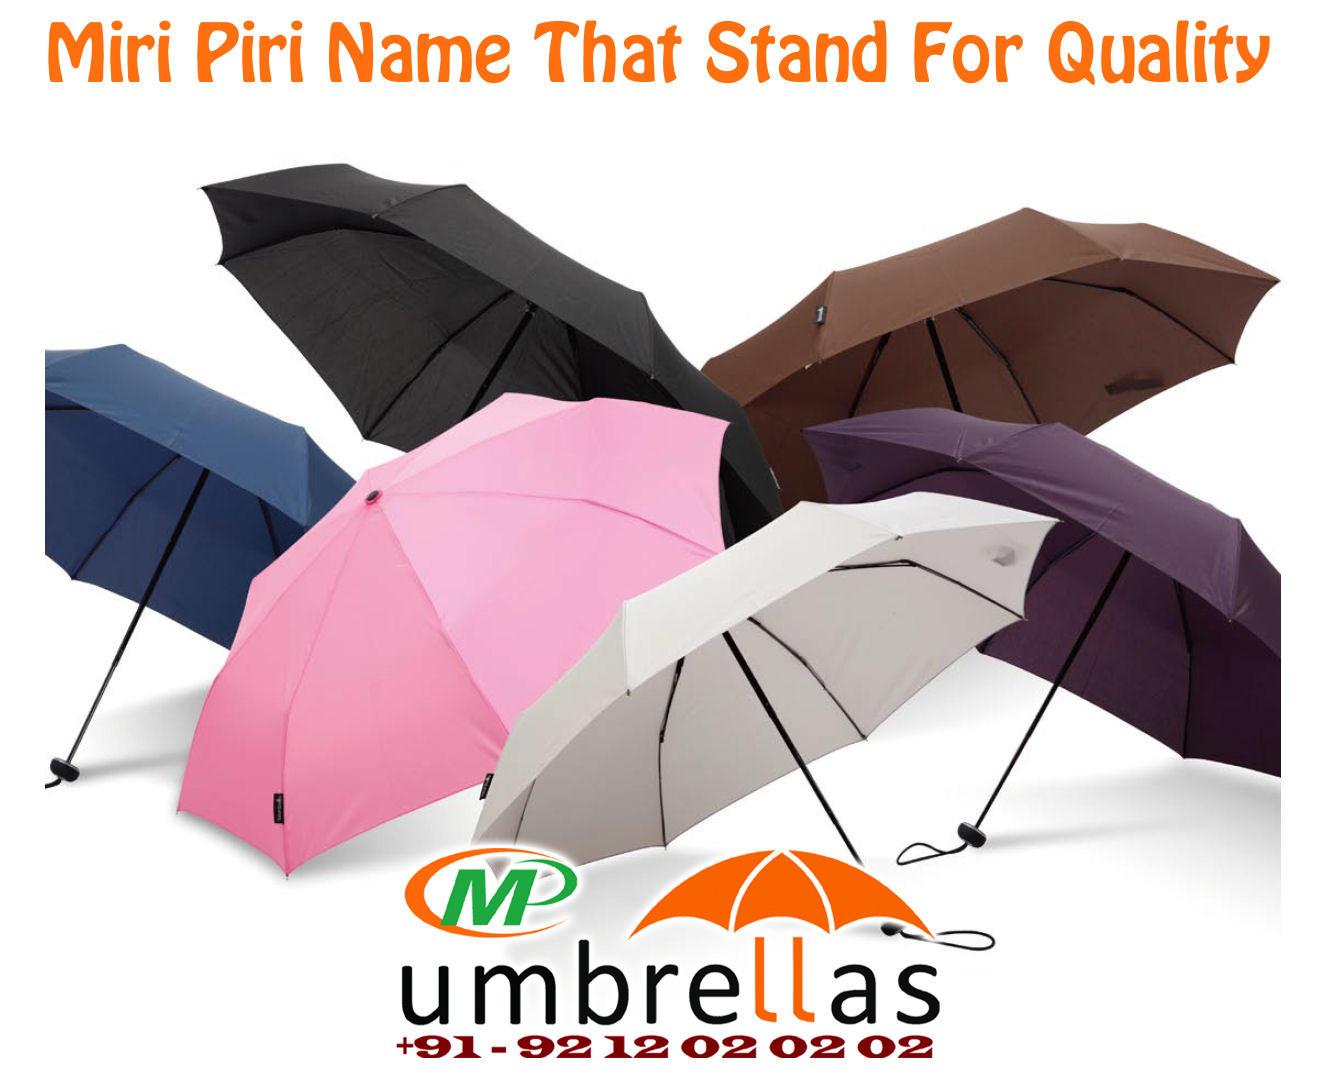 Umbrella Pole Manufacturers Mail: Manufacturers Of Promotional Umbrella, Canopies, Gazebo